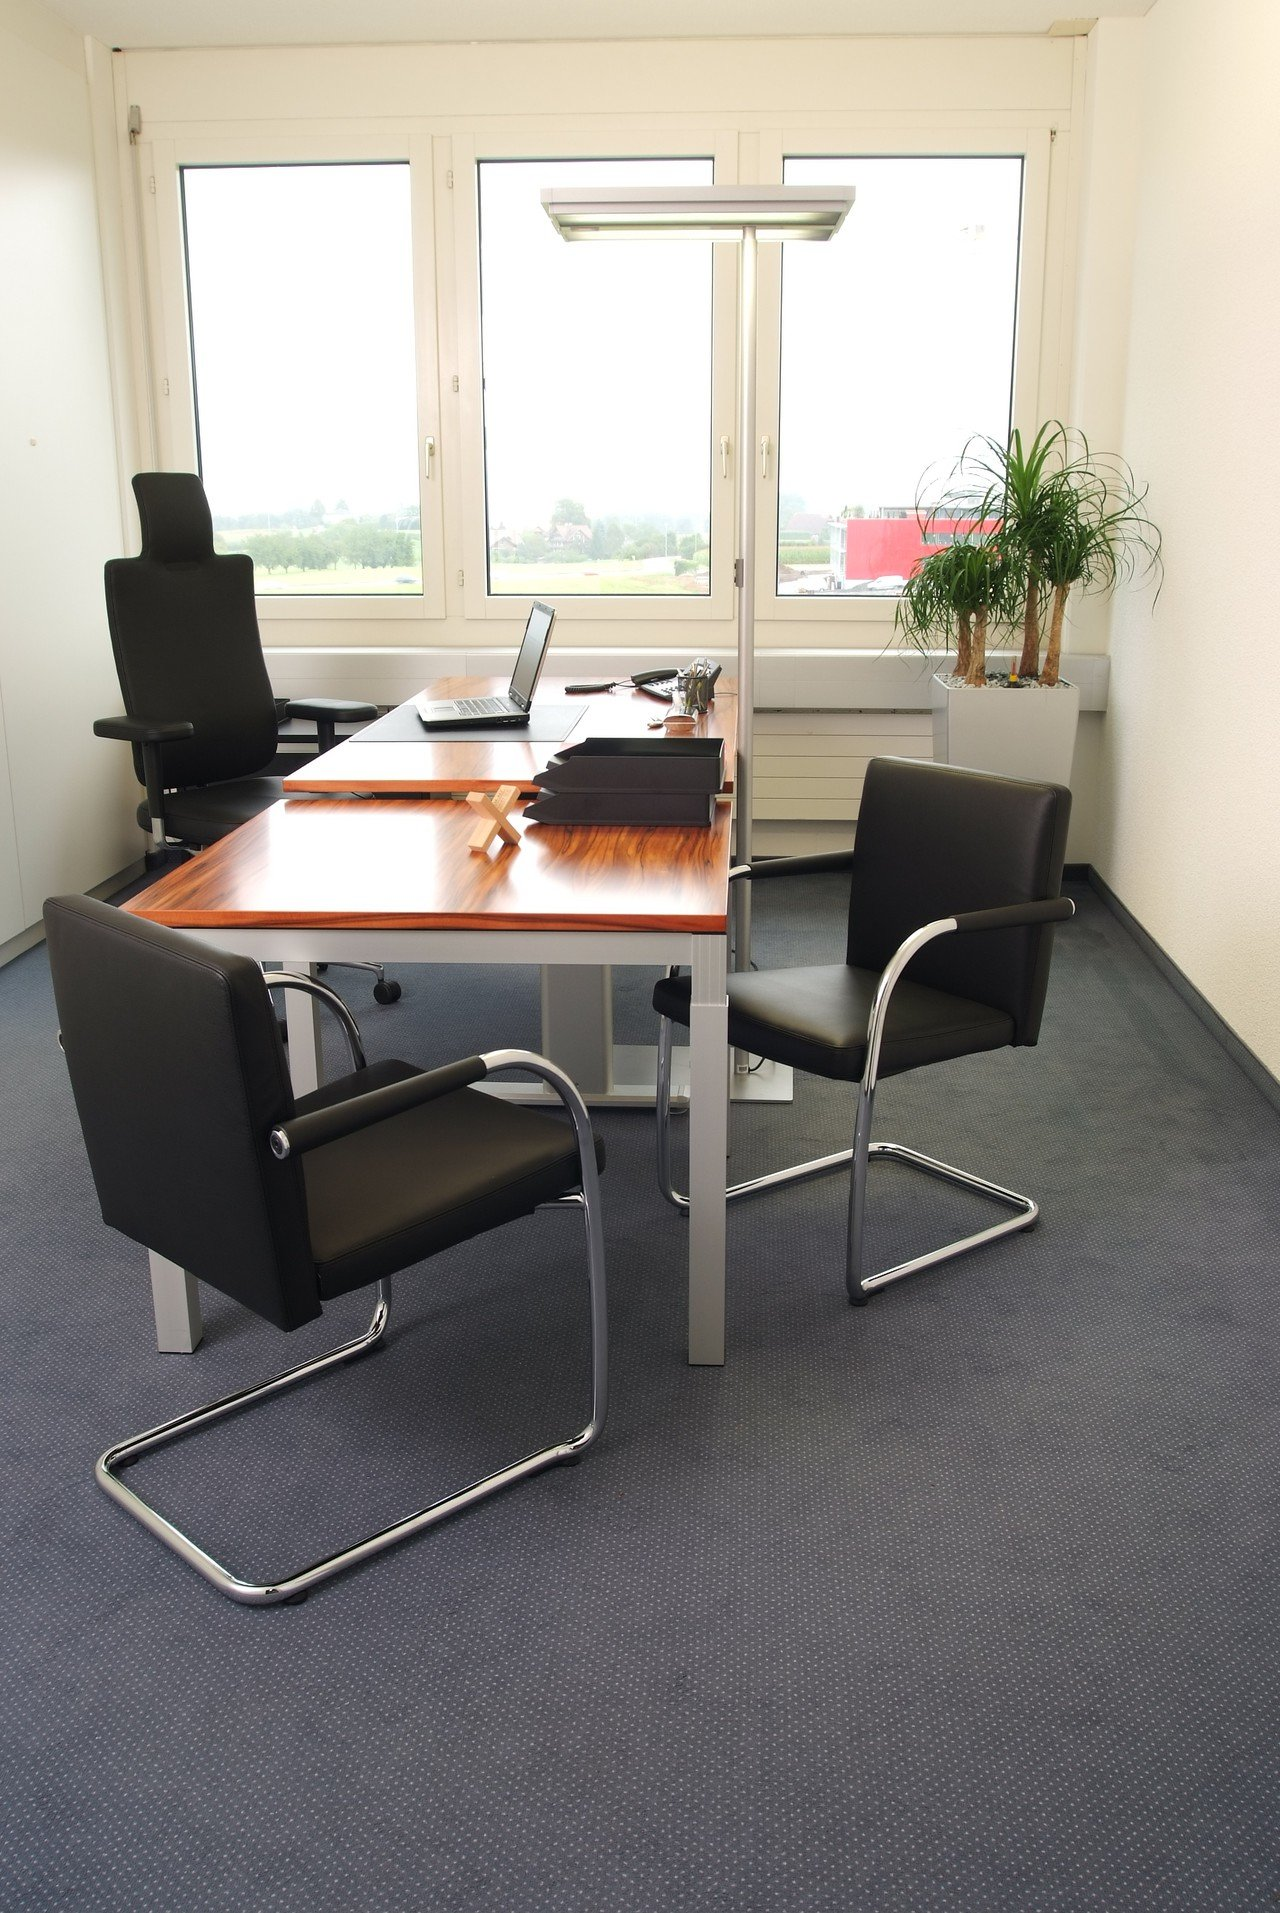 Rest der Welt conference rooms Meetingraum ecos office center hünenberg - Tagesbüro image 0